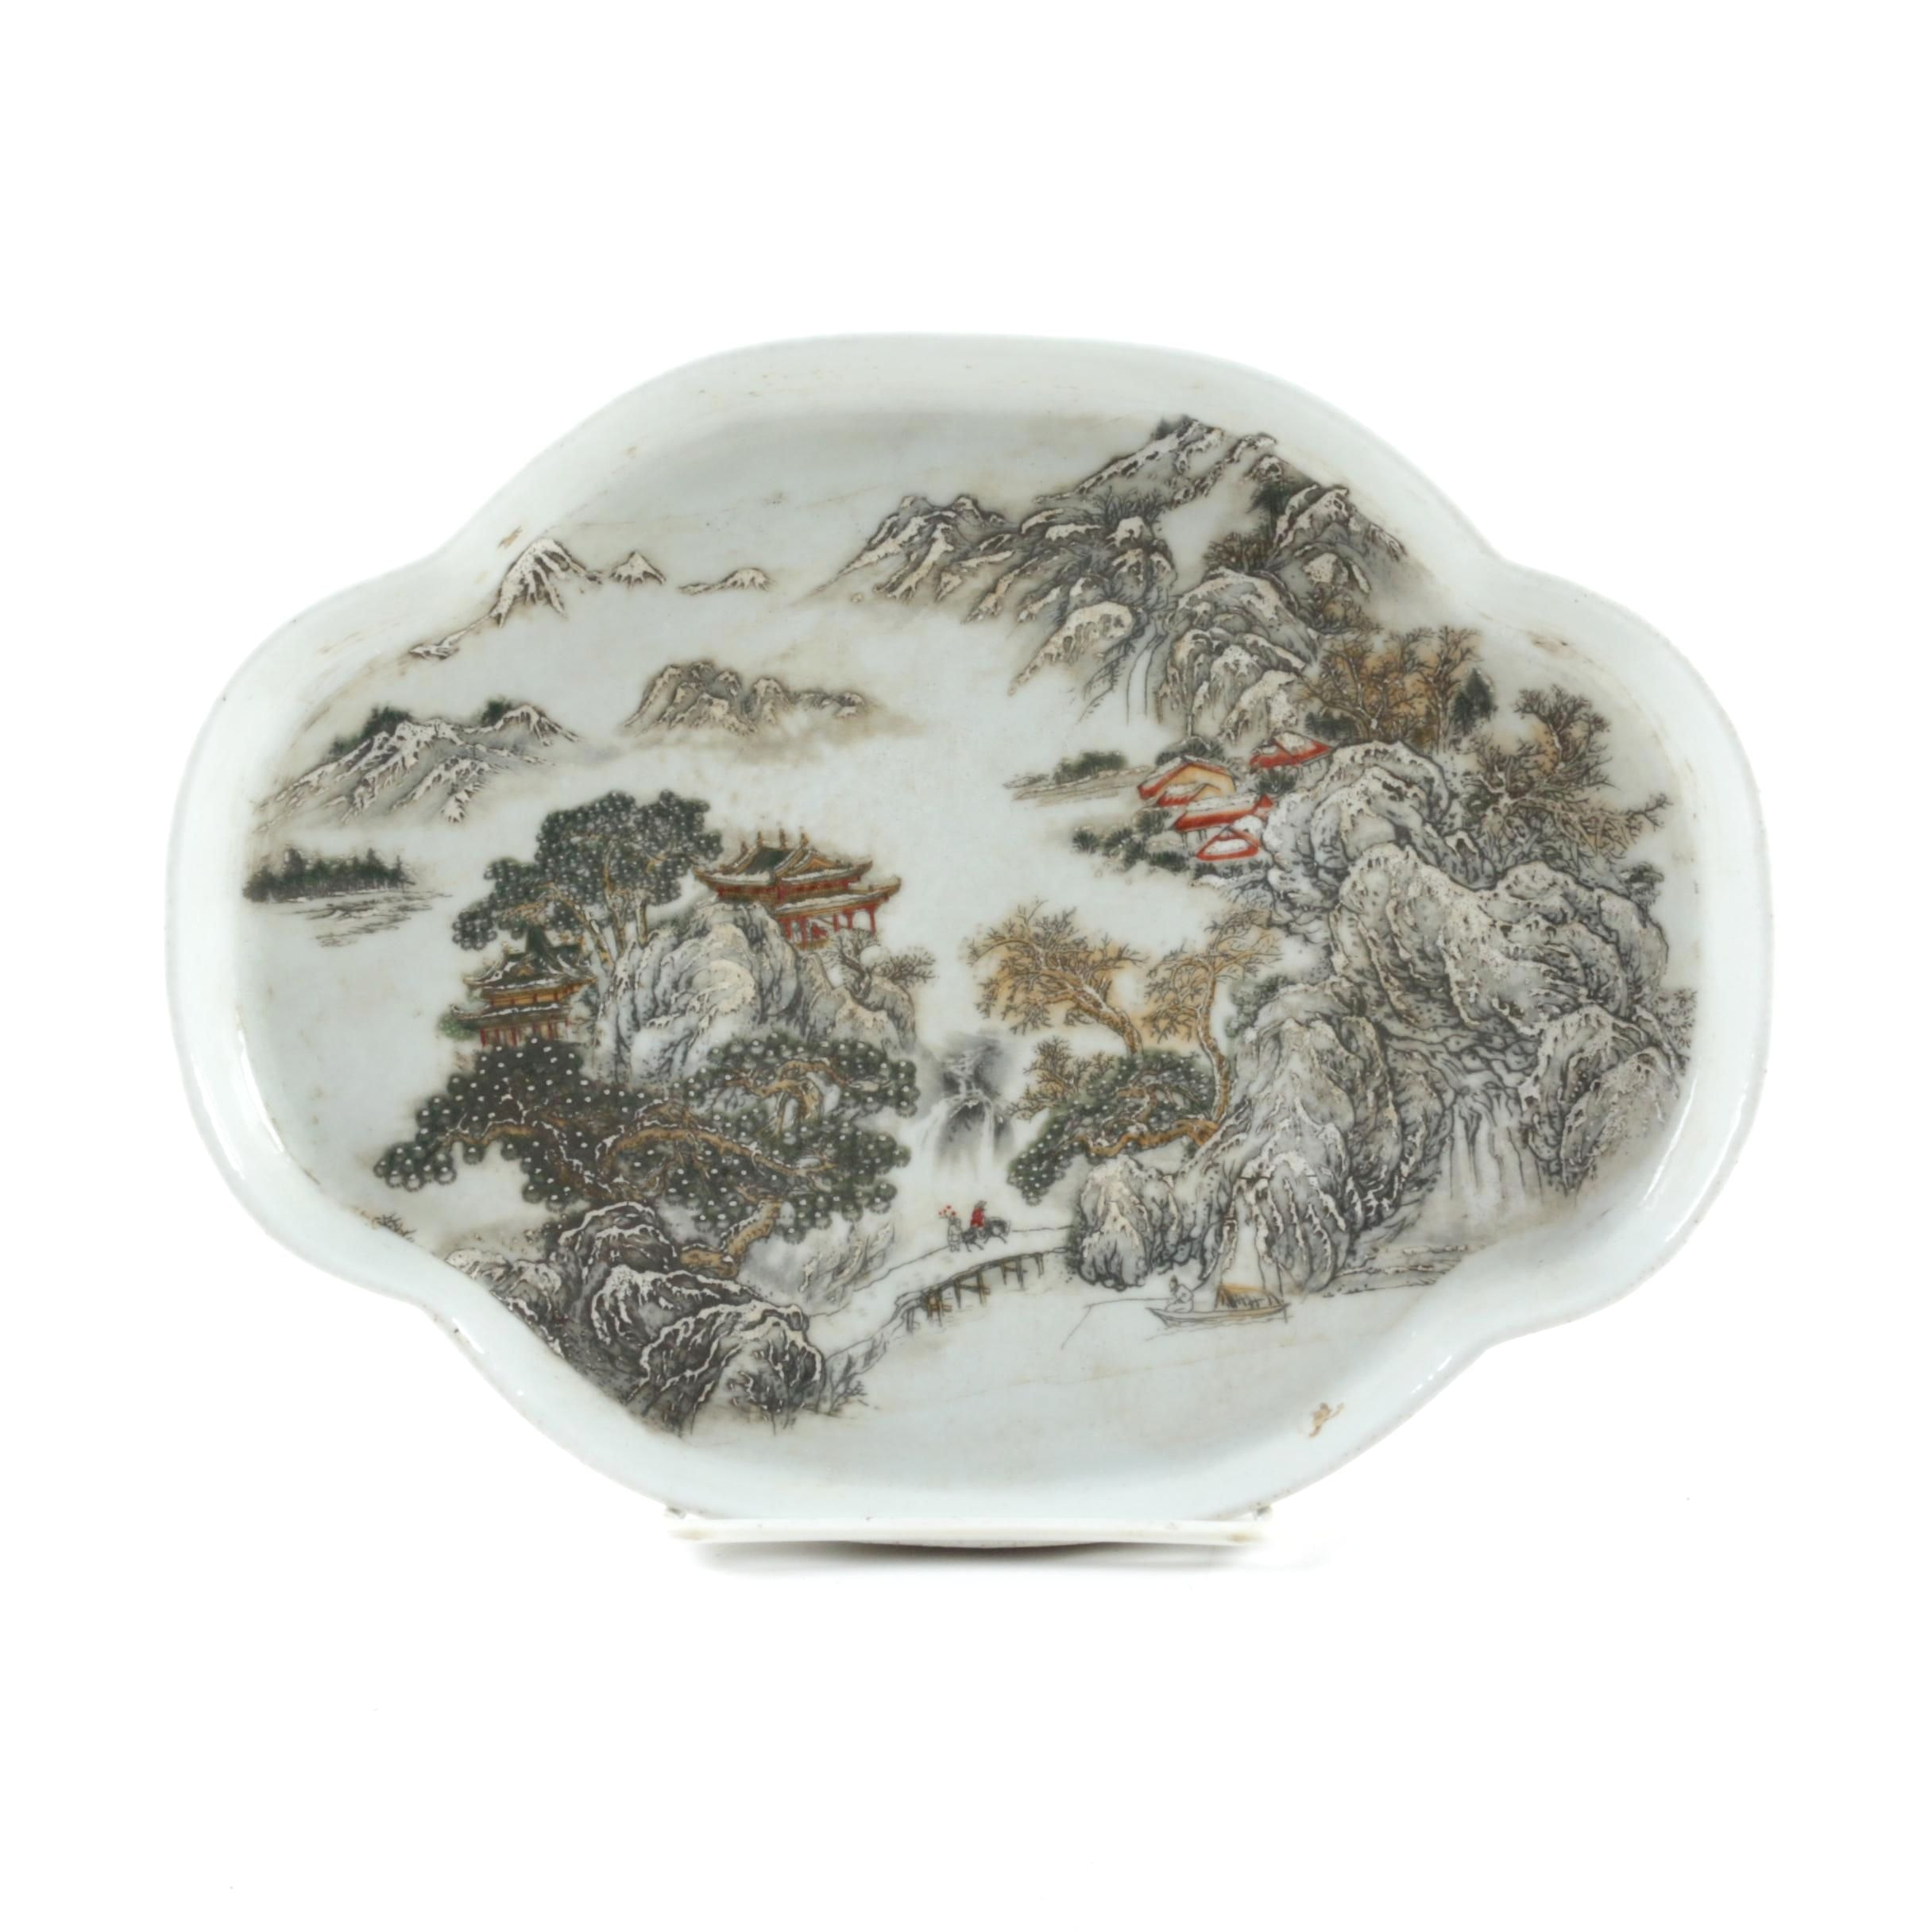 Chinese Landscape Porcelain Tray